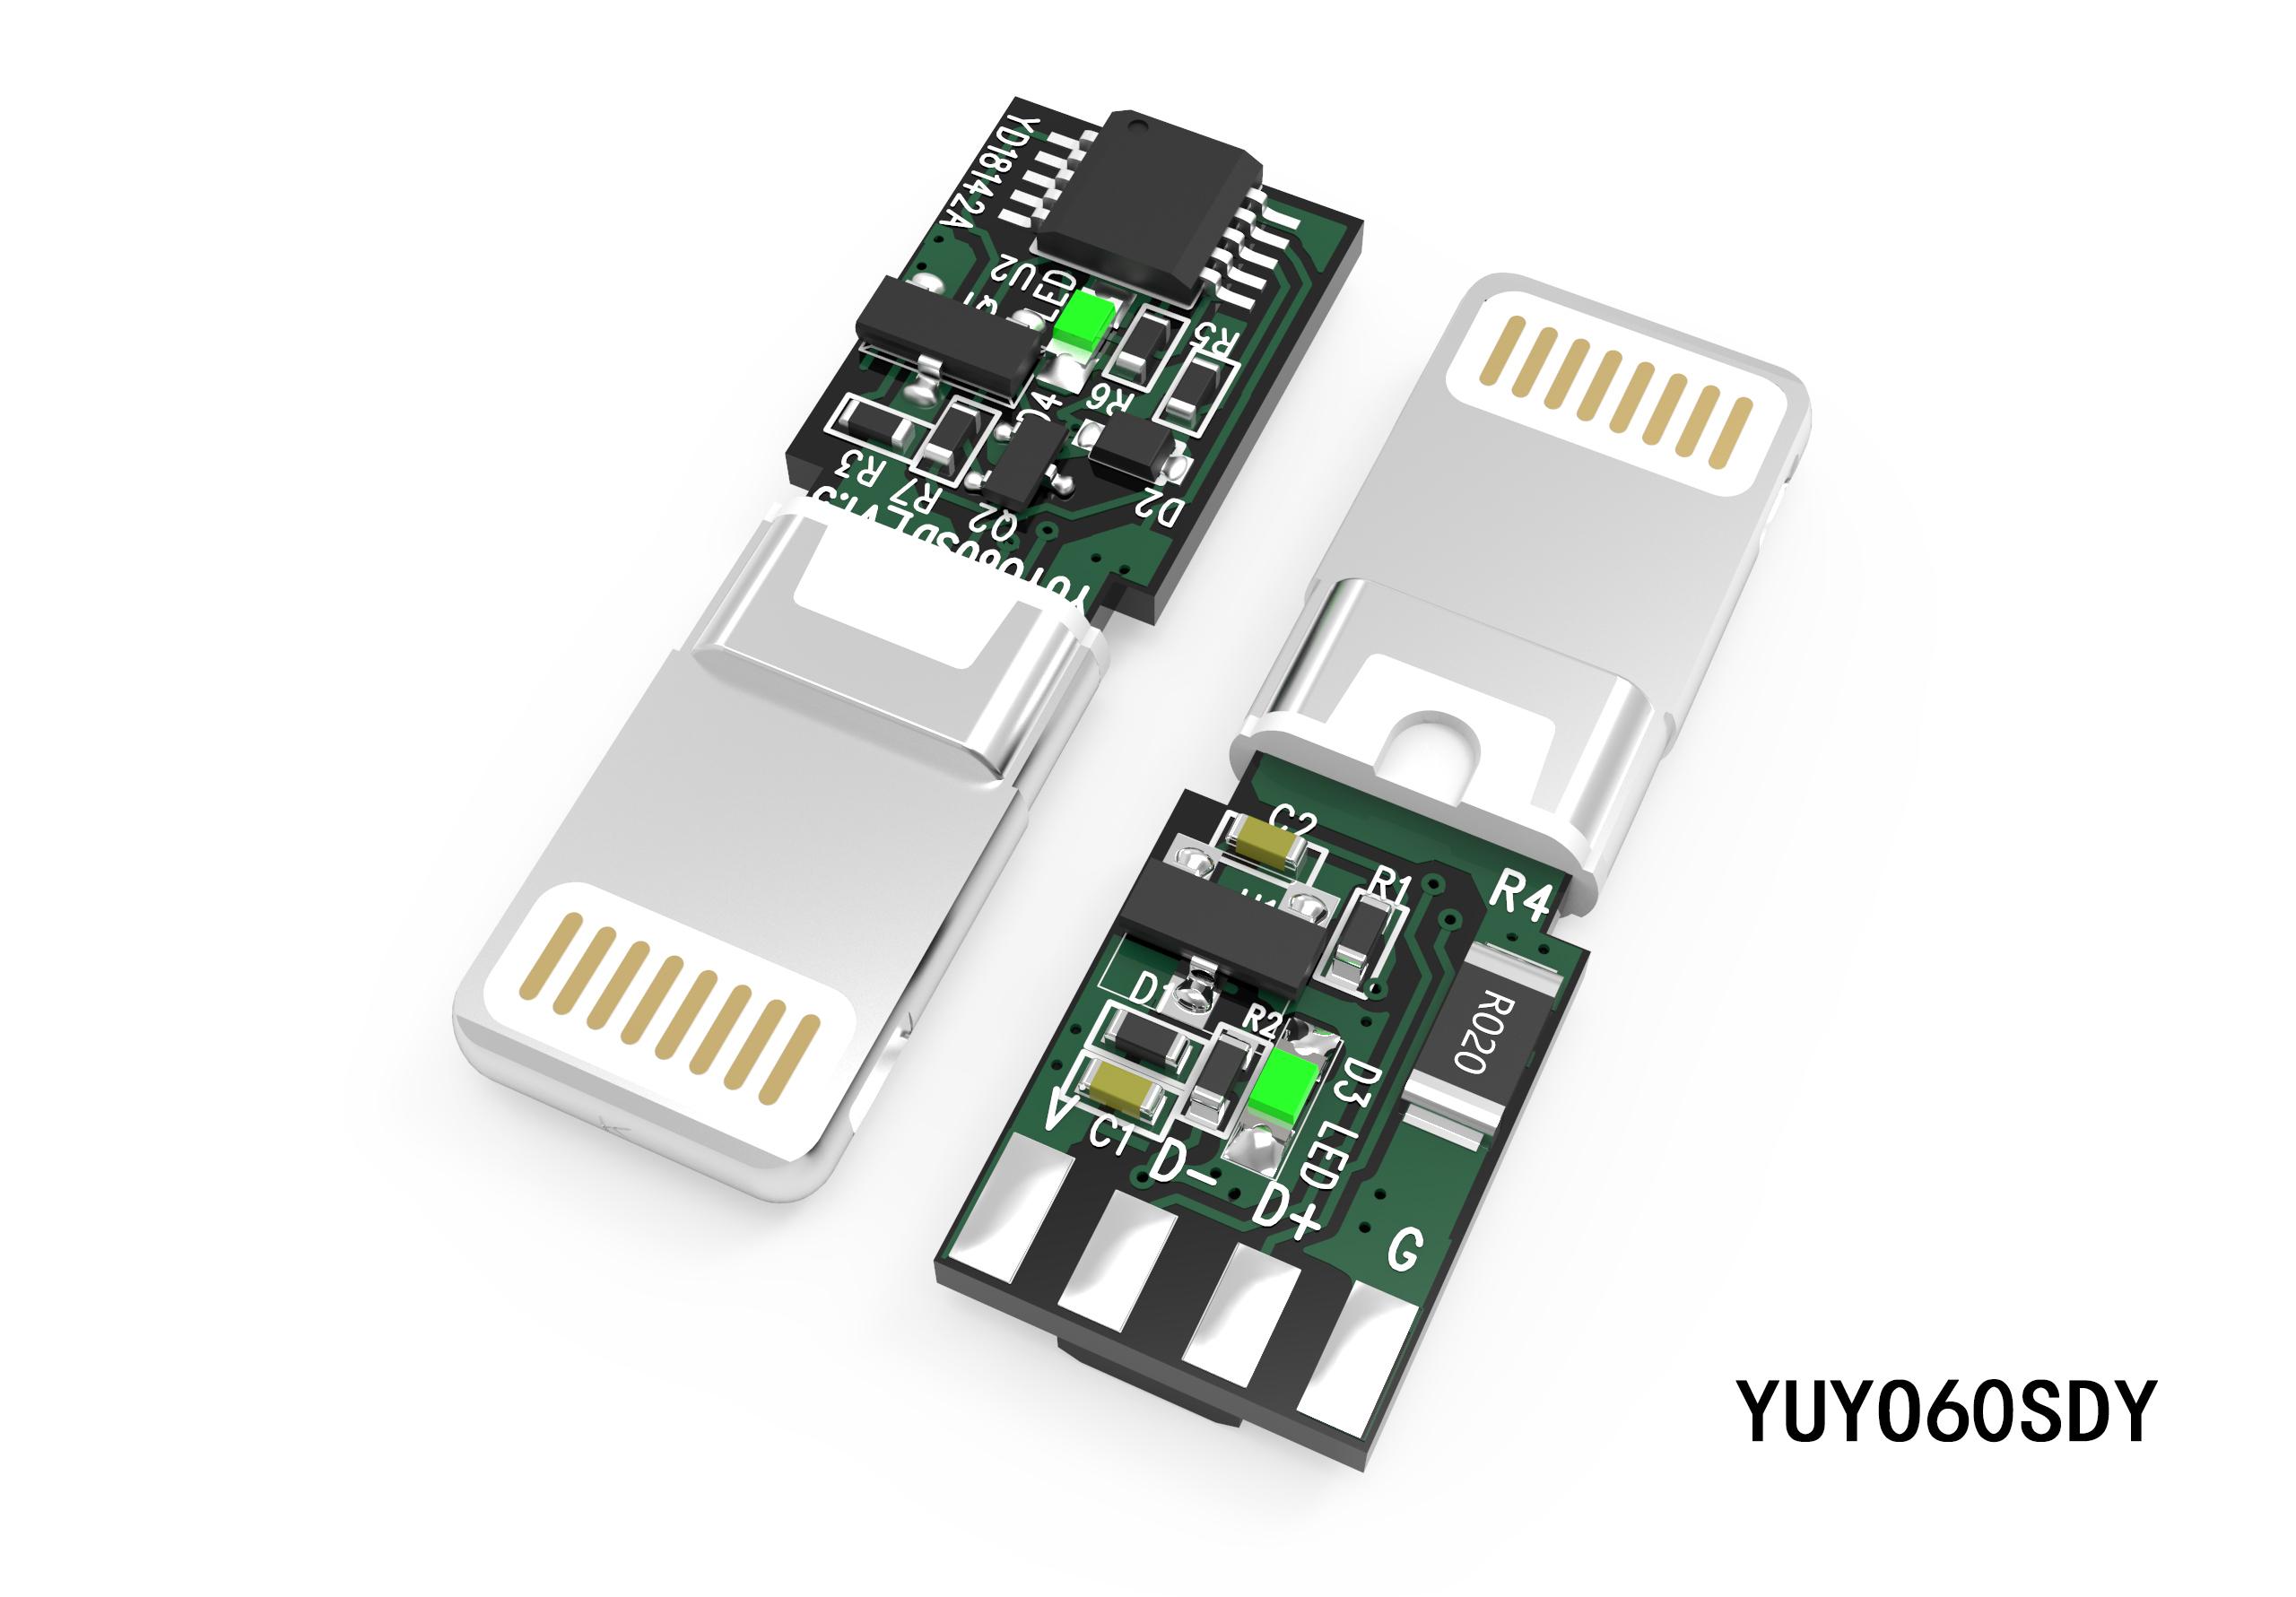 8P一体式转接头插头YUYO60SDY